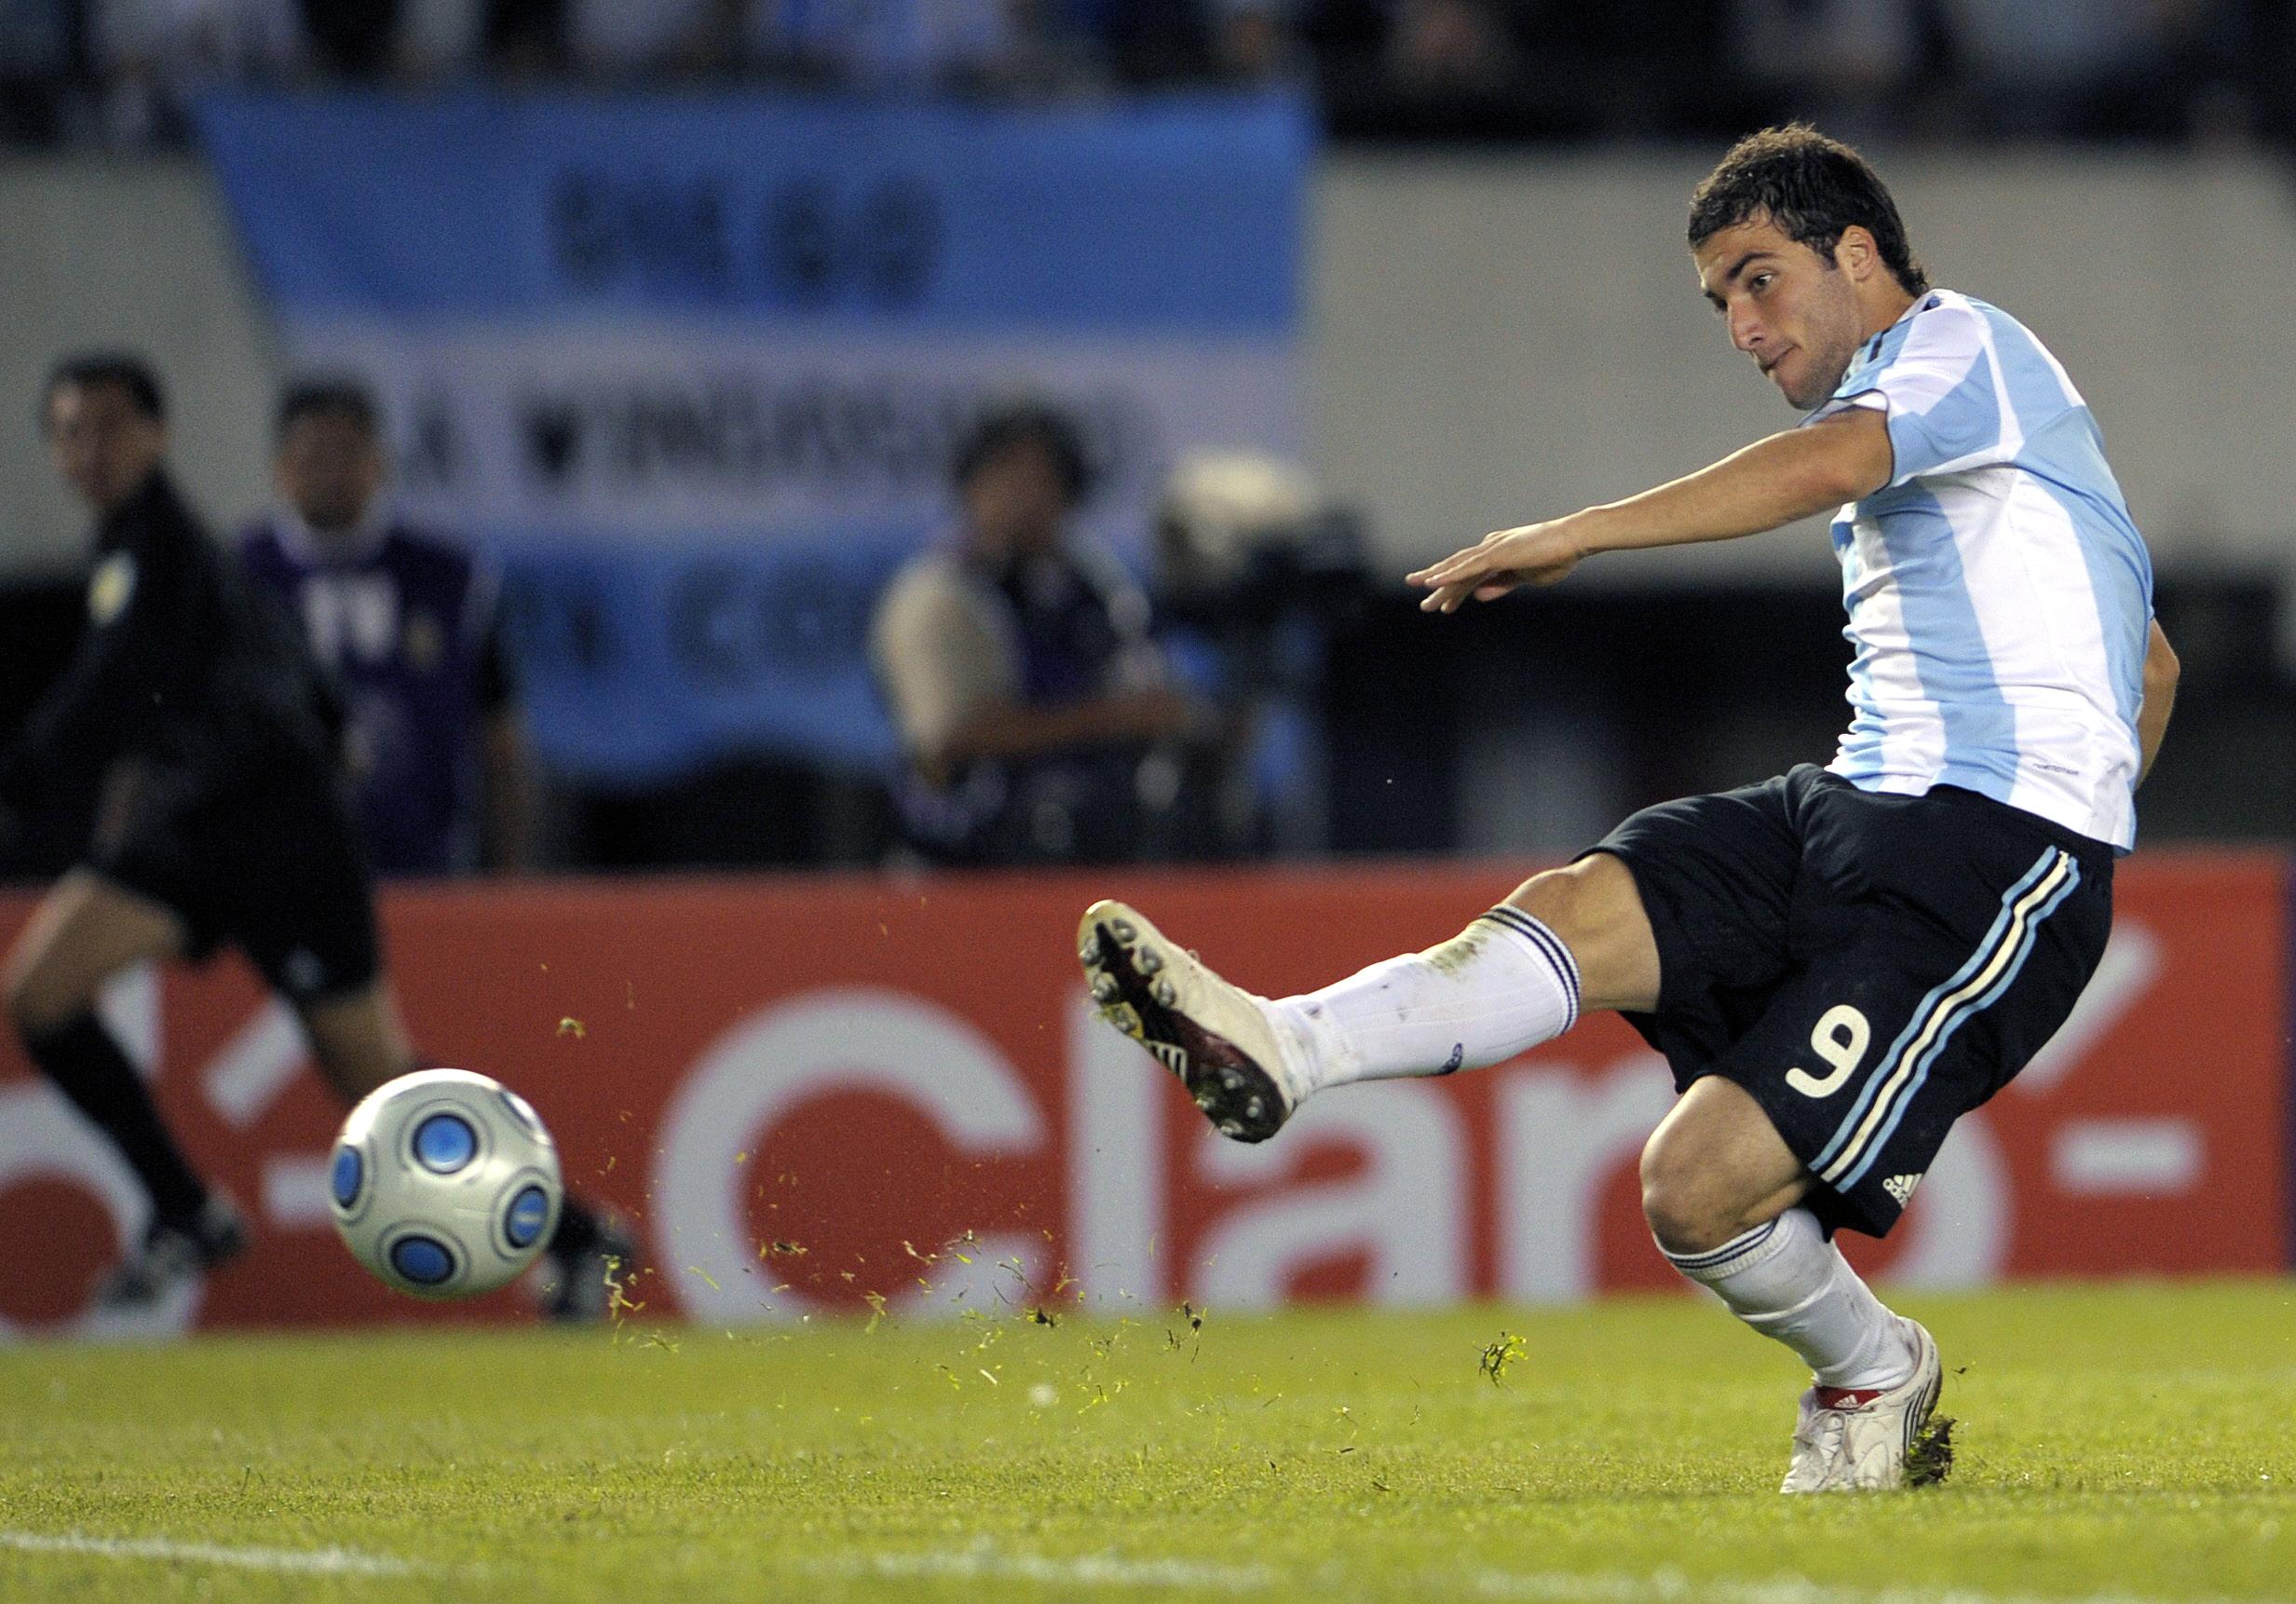 Gonzalo Higuain Argentina Peru 2010 FIFA World Cup qualifier debut goal 2009